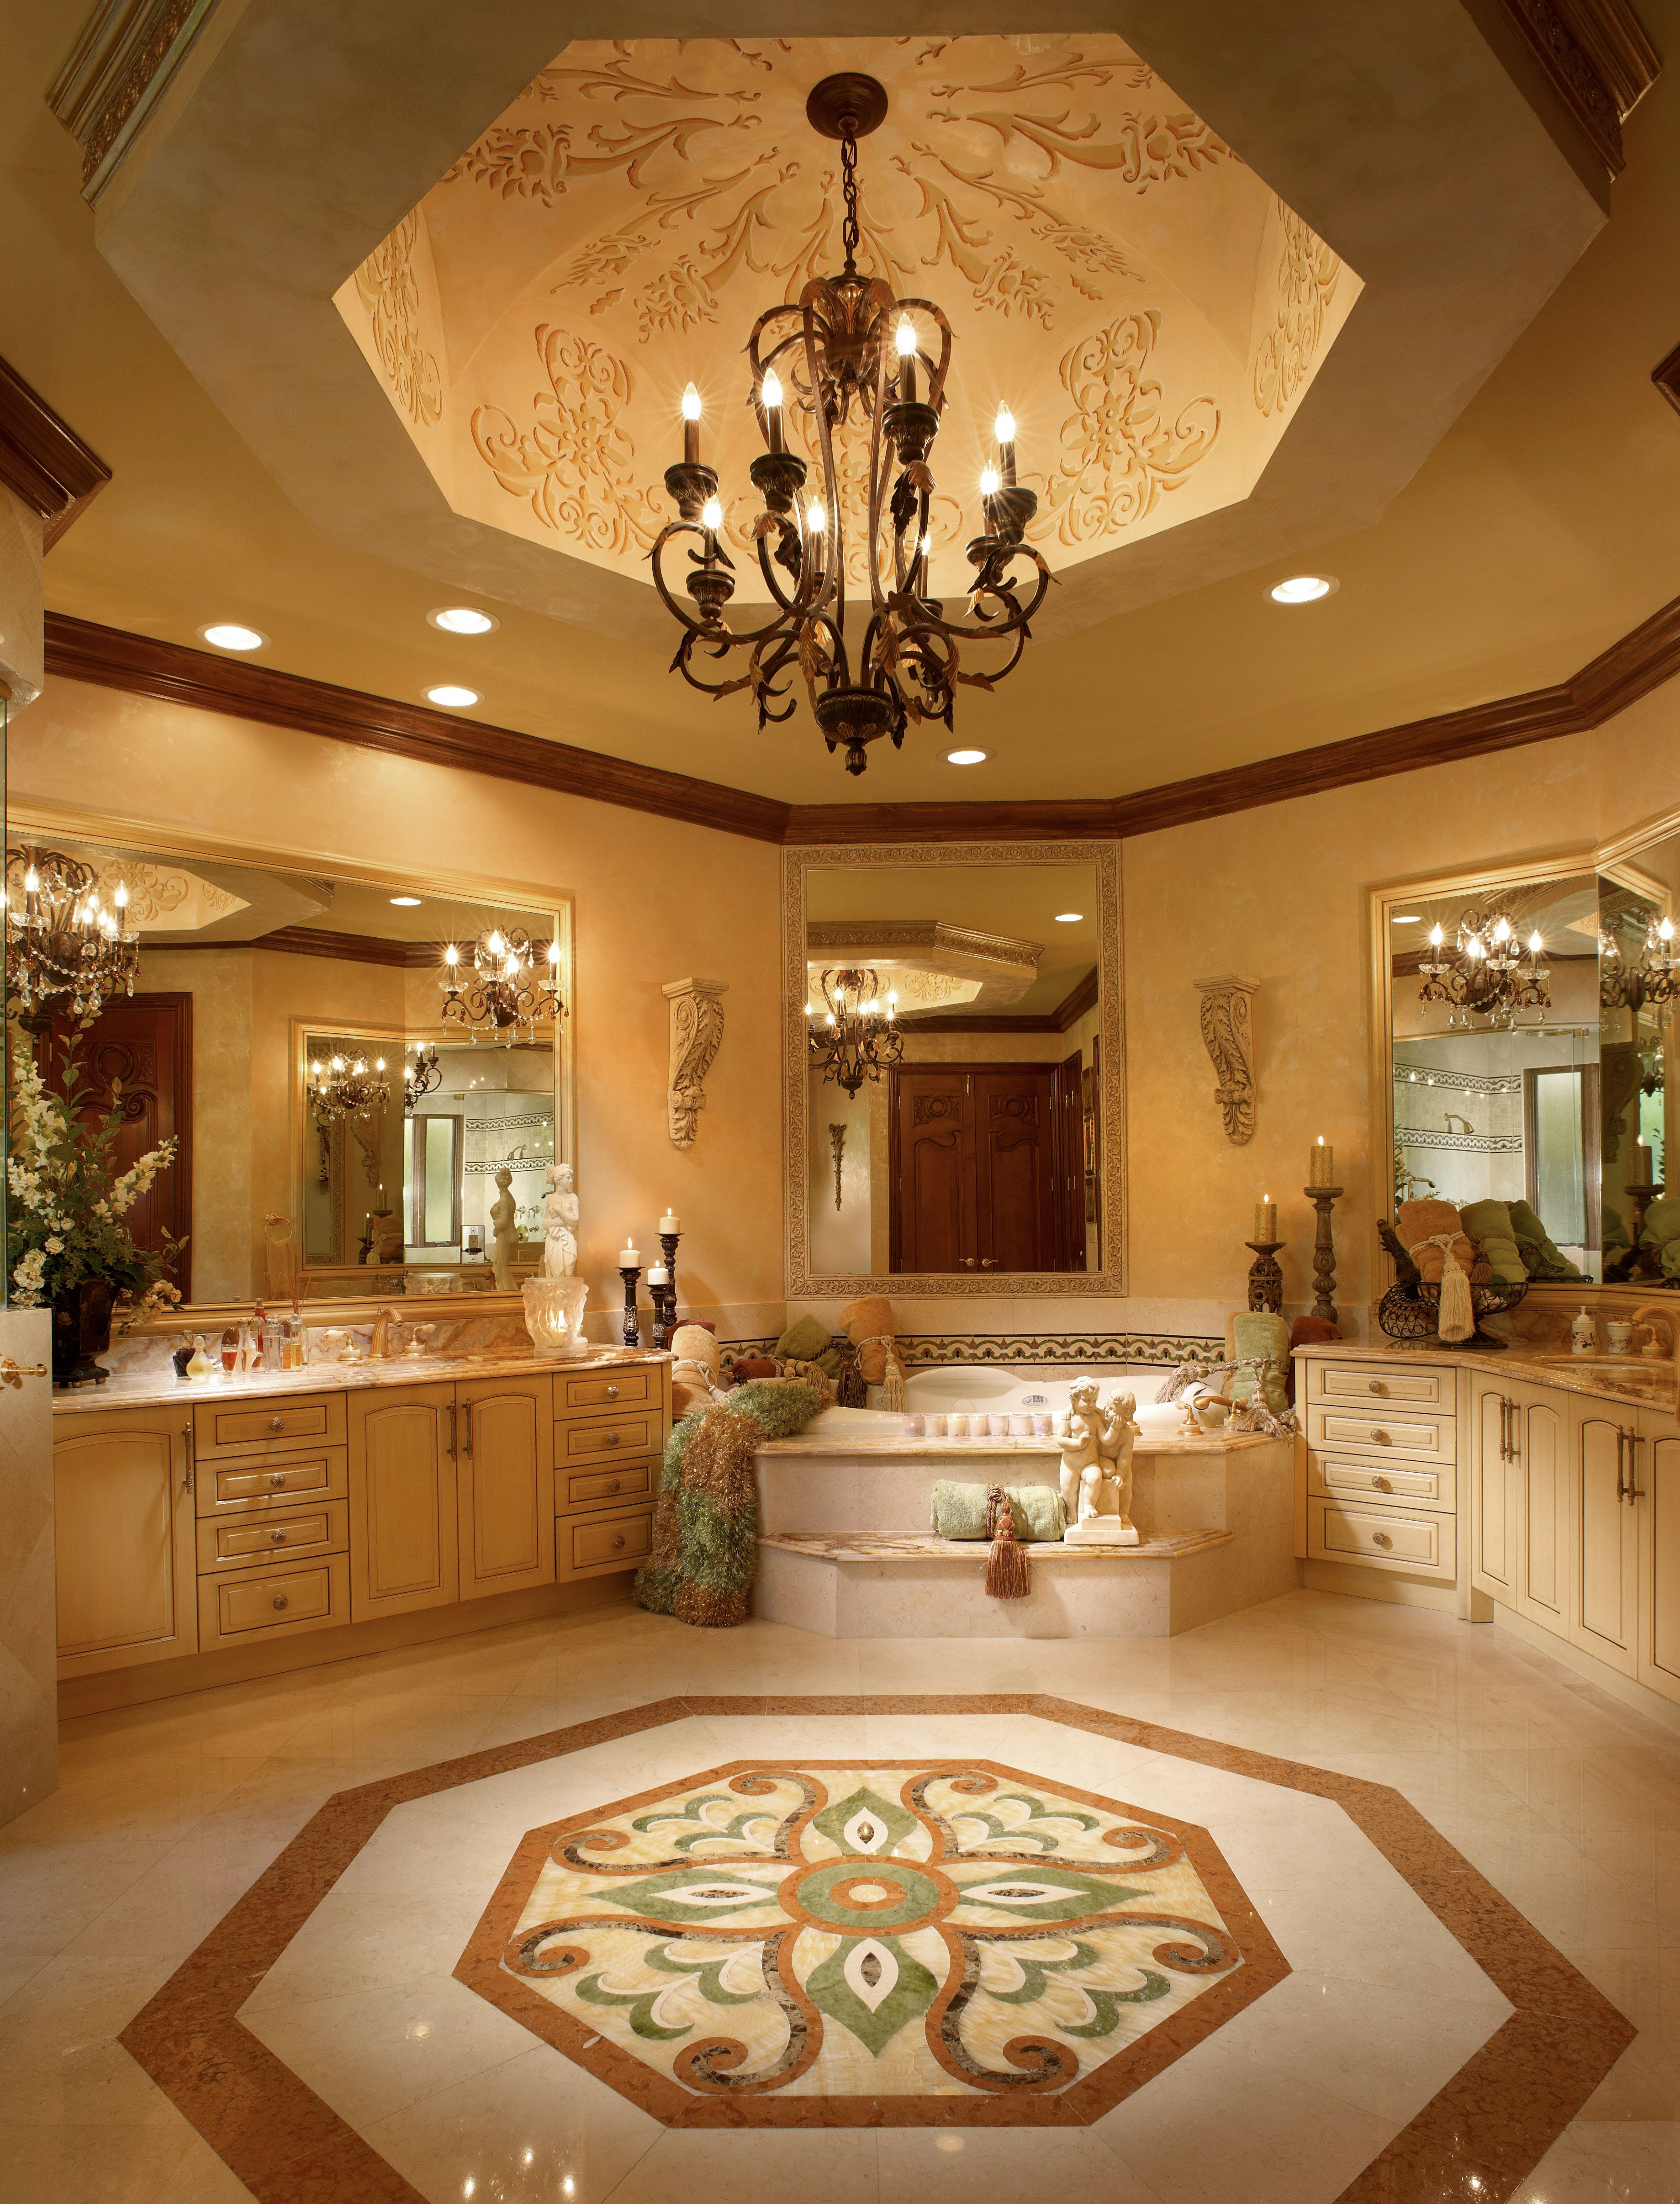 Wwwperlalichi  Master Interior Designer Perla Lichi Delectable Million Dollar Bathroom Designs Design Ideas